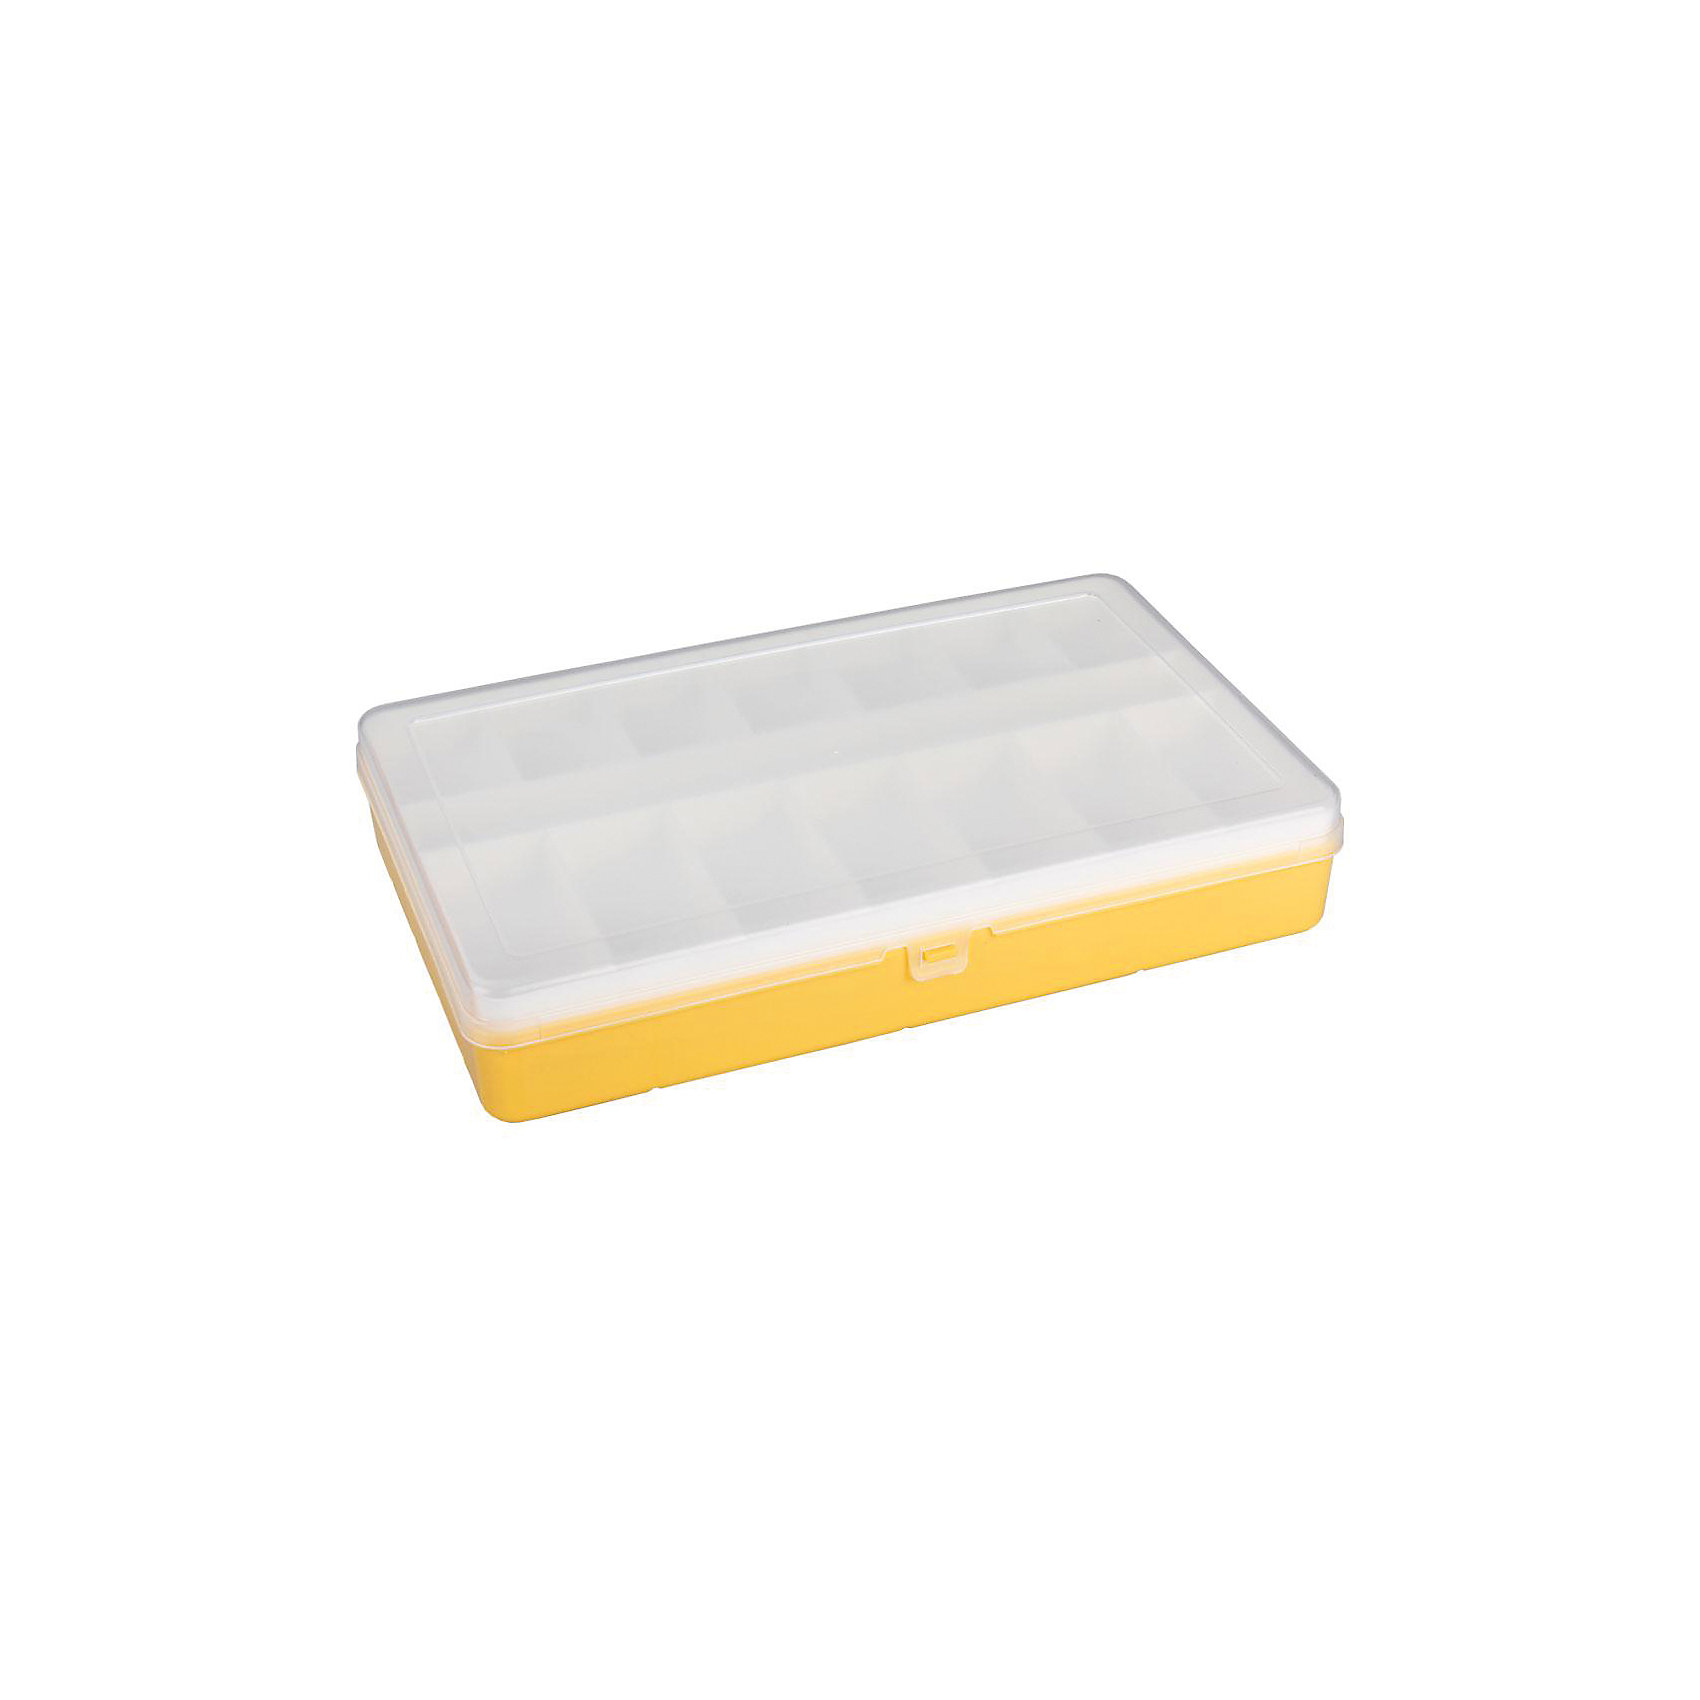 Alternativa Контейнер для мелочей (290х180), Alternativa, желтый alternativa ящик для инструментов 585х255х250 alternativa